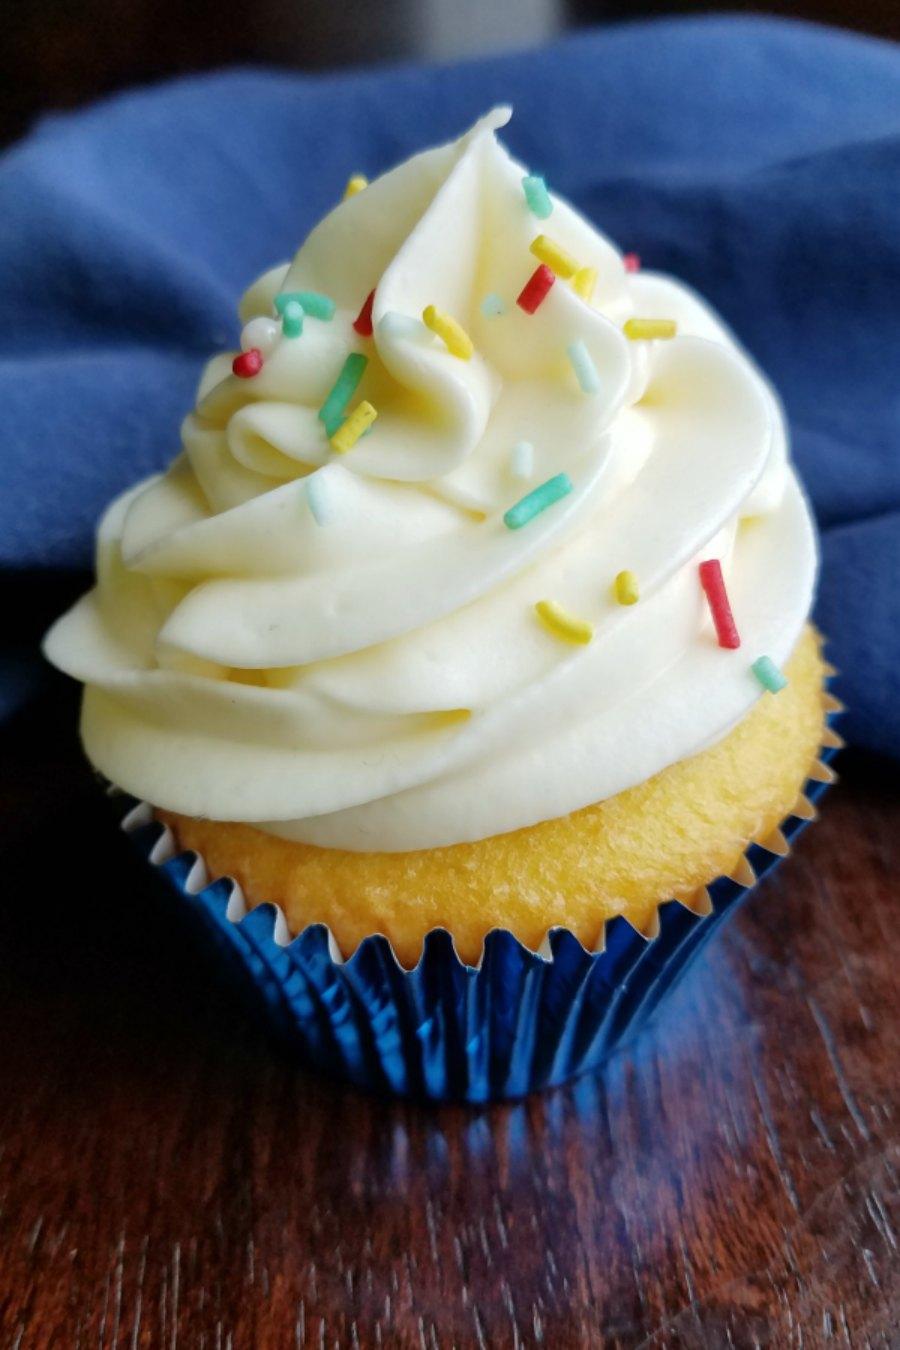 tall puffy swirl of lemonade frosting on cupcake